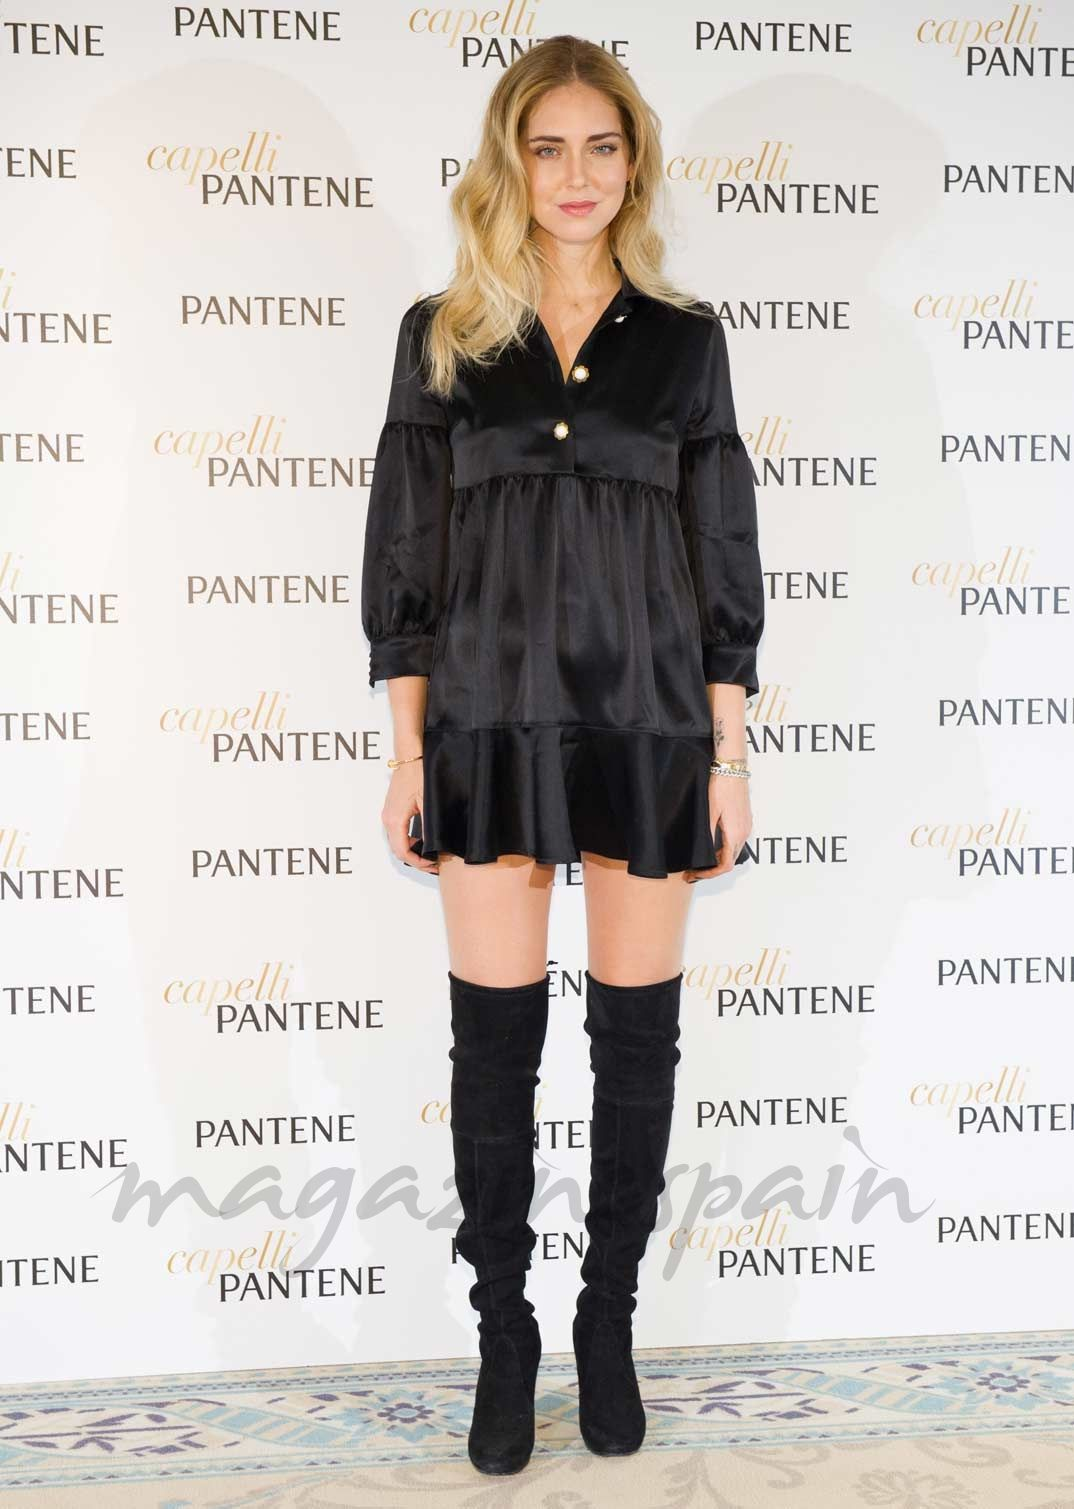 Chiara Ferragni, lección de estilo con un little black dress